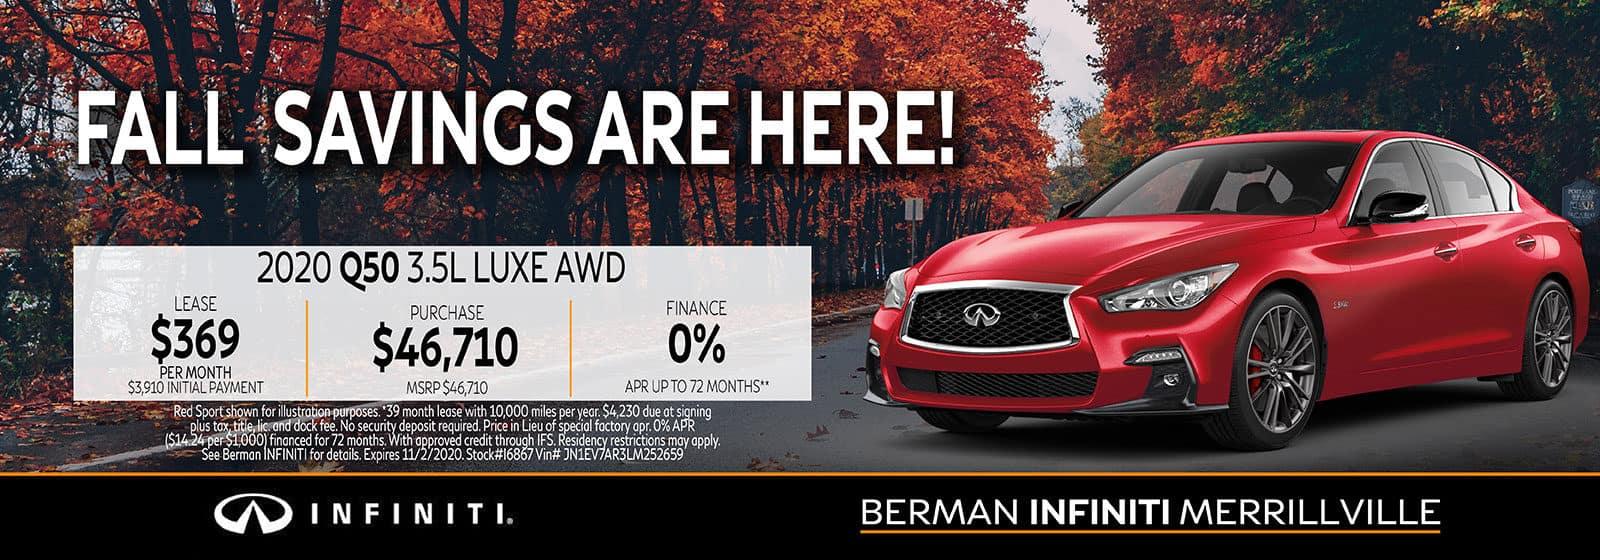 New 2020 INFINITI Q50 October Offer at Berman INFINITI of Merrillville!